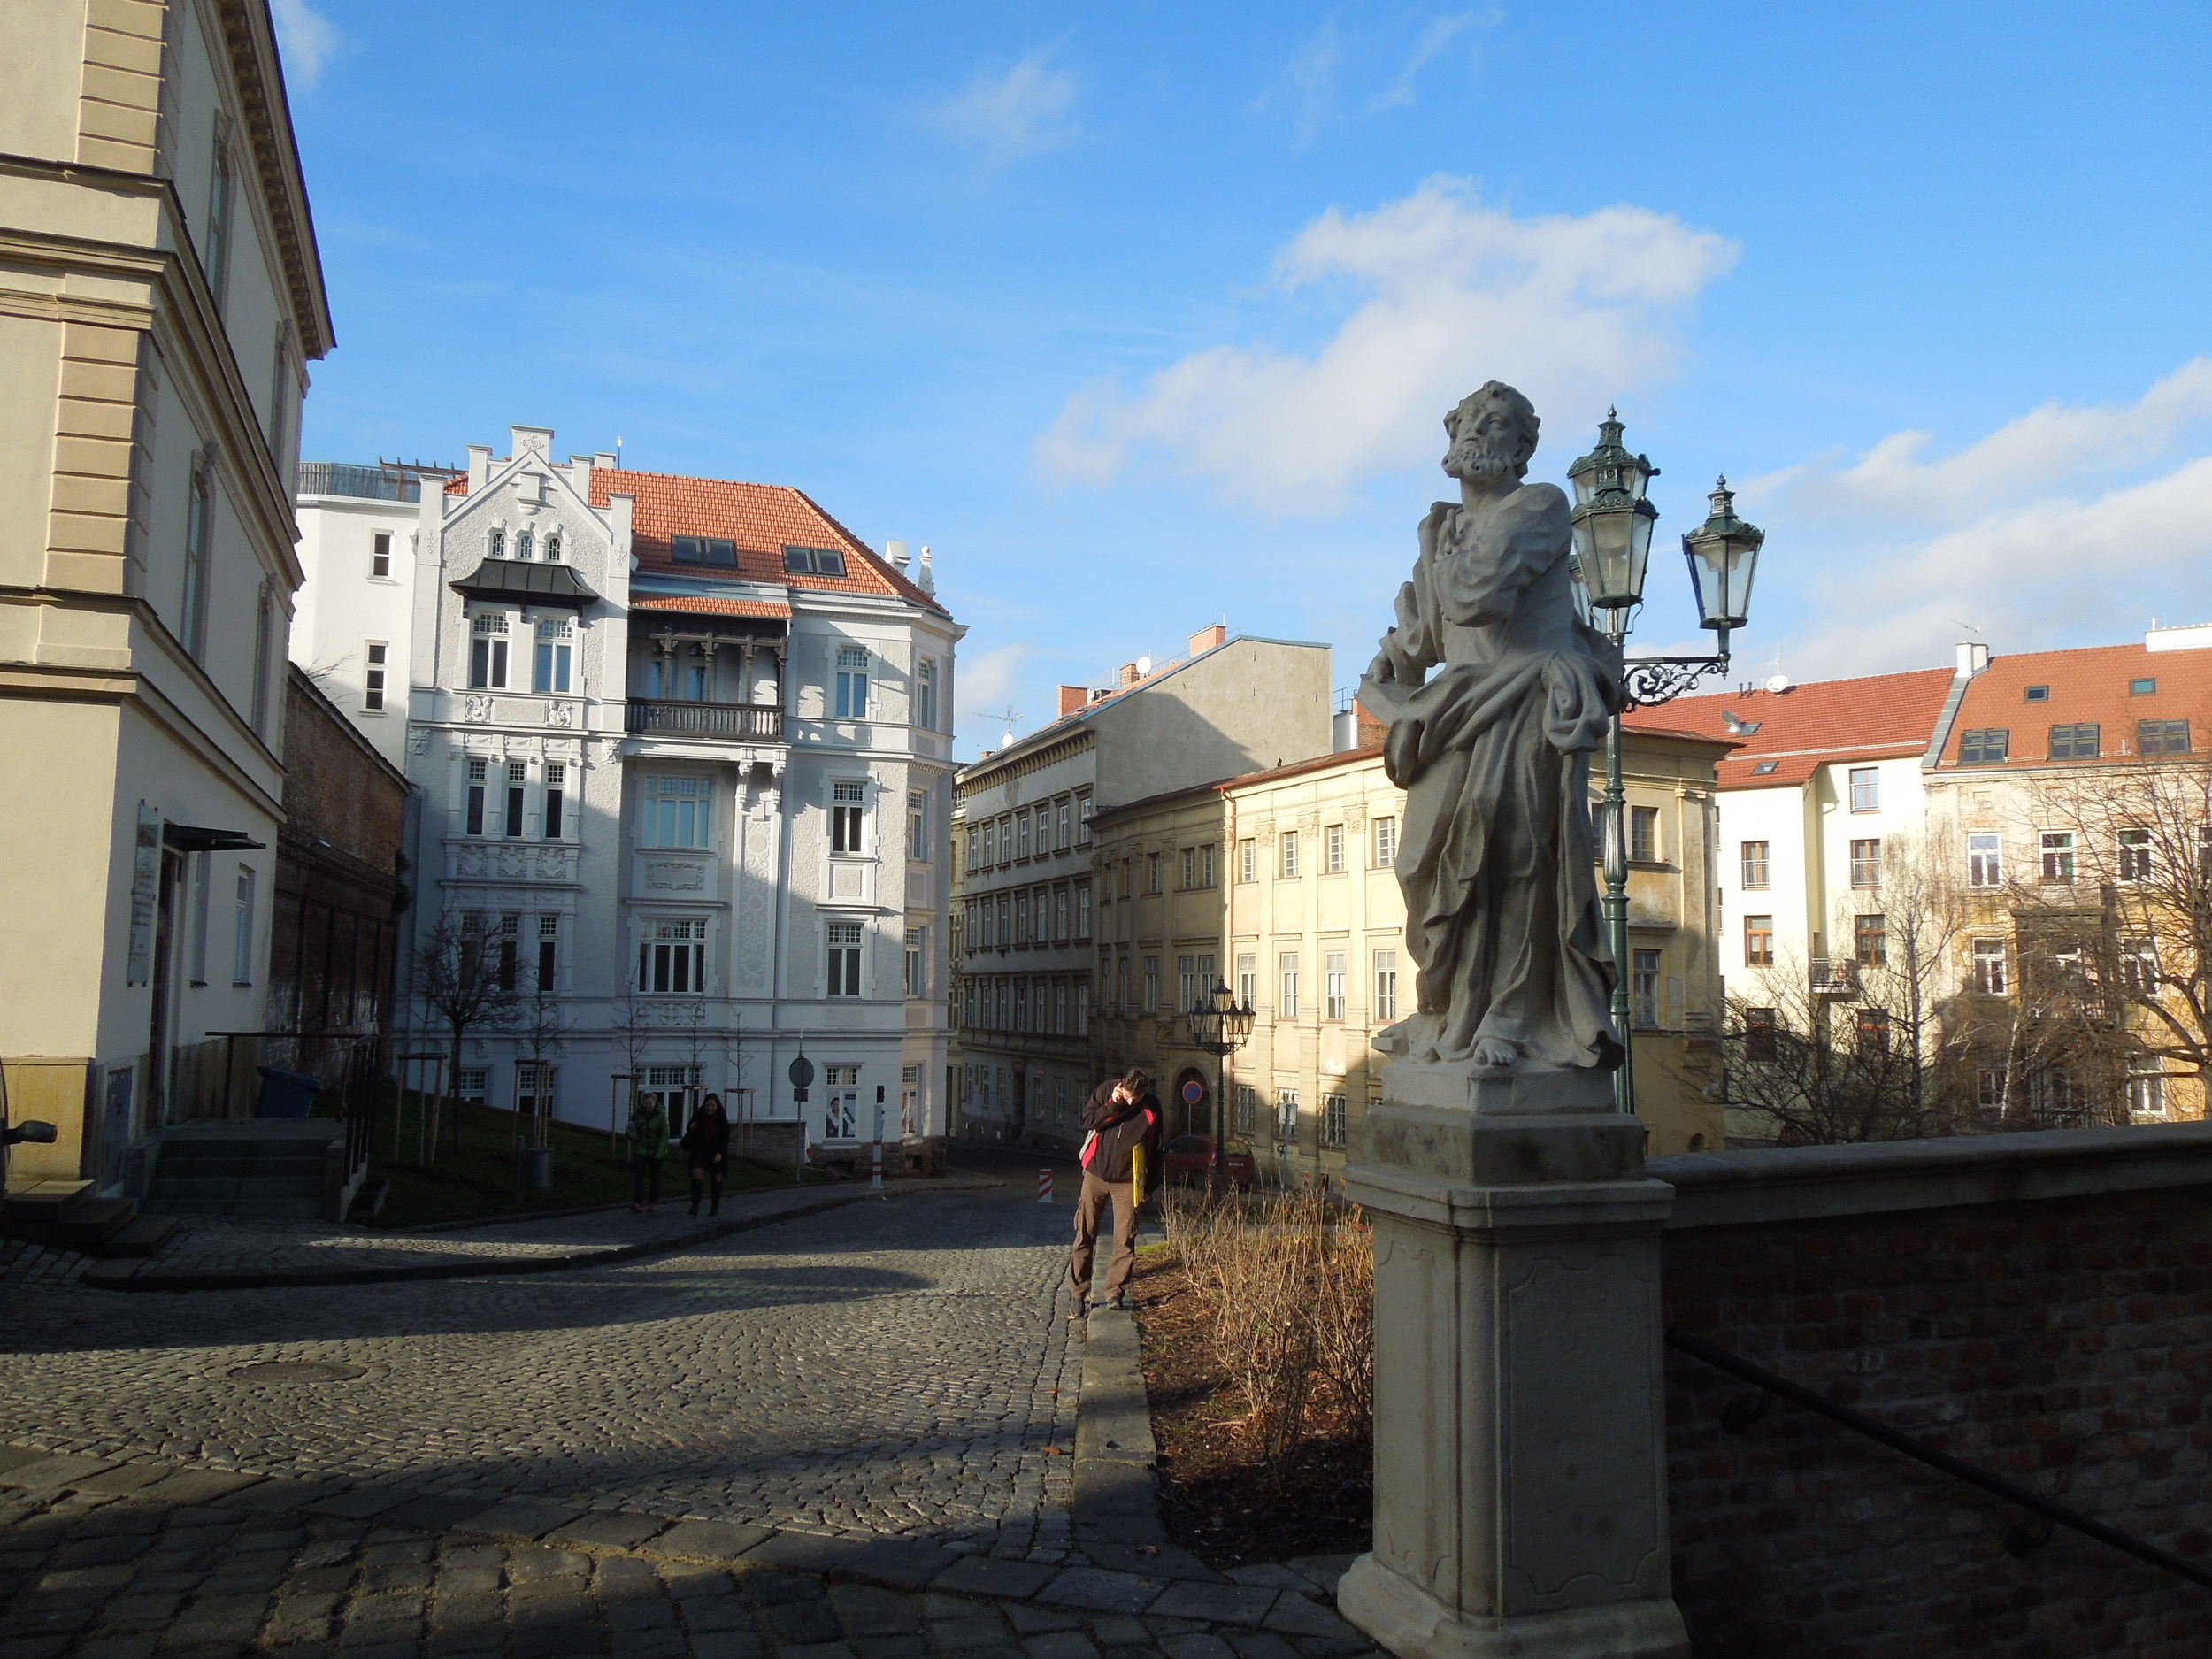 Stevko-Brno-Street.JPG